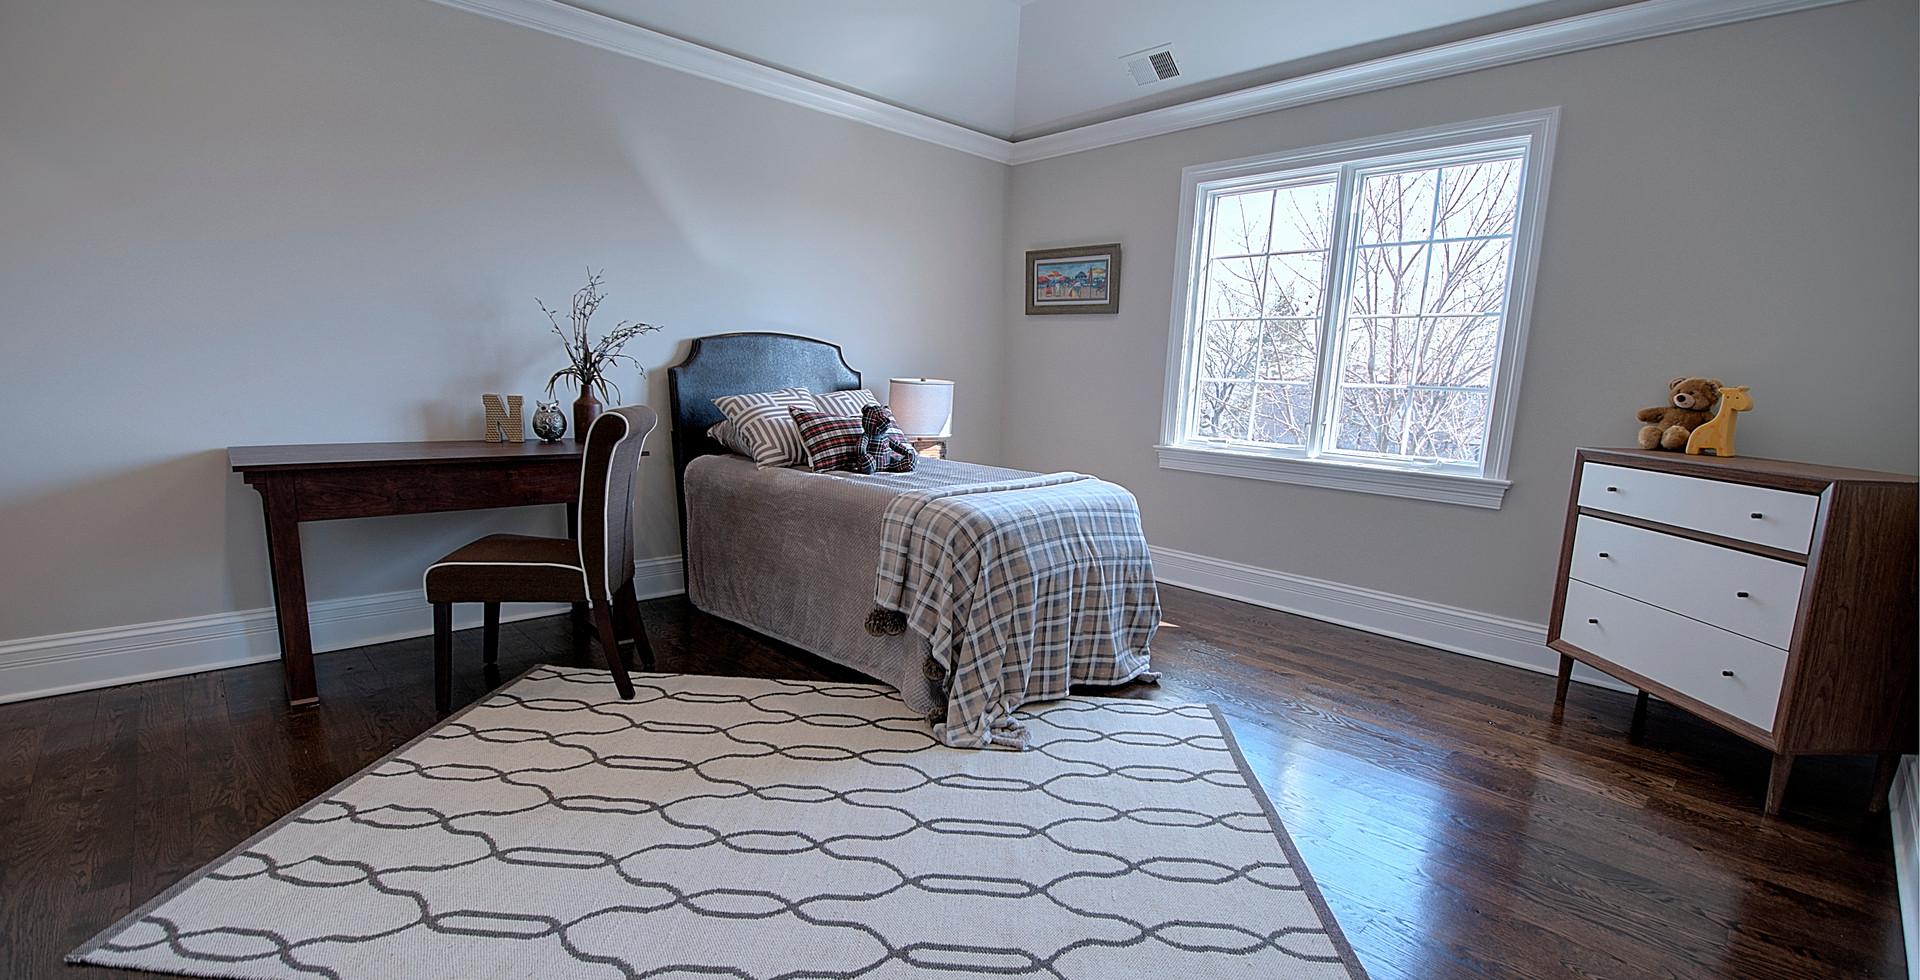 Bedroom in Bensenville designed by MRM Home Design.jpg